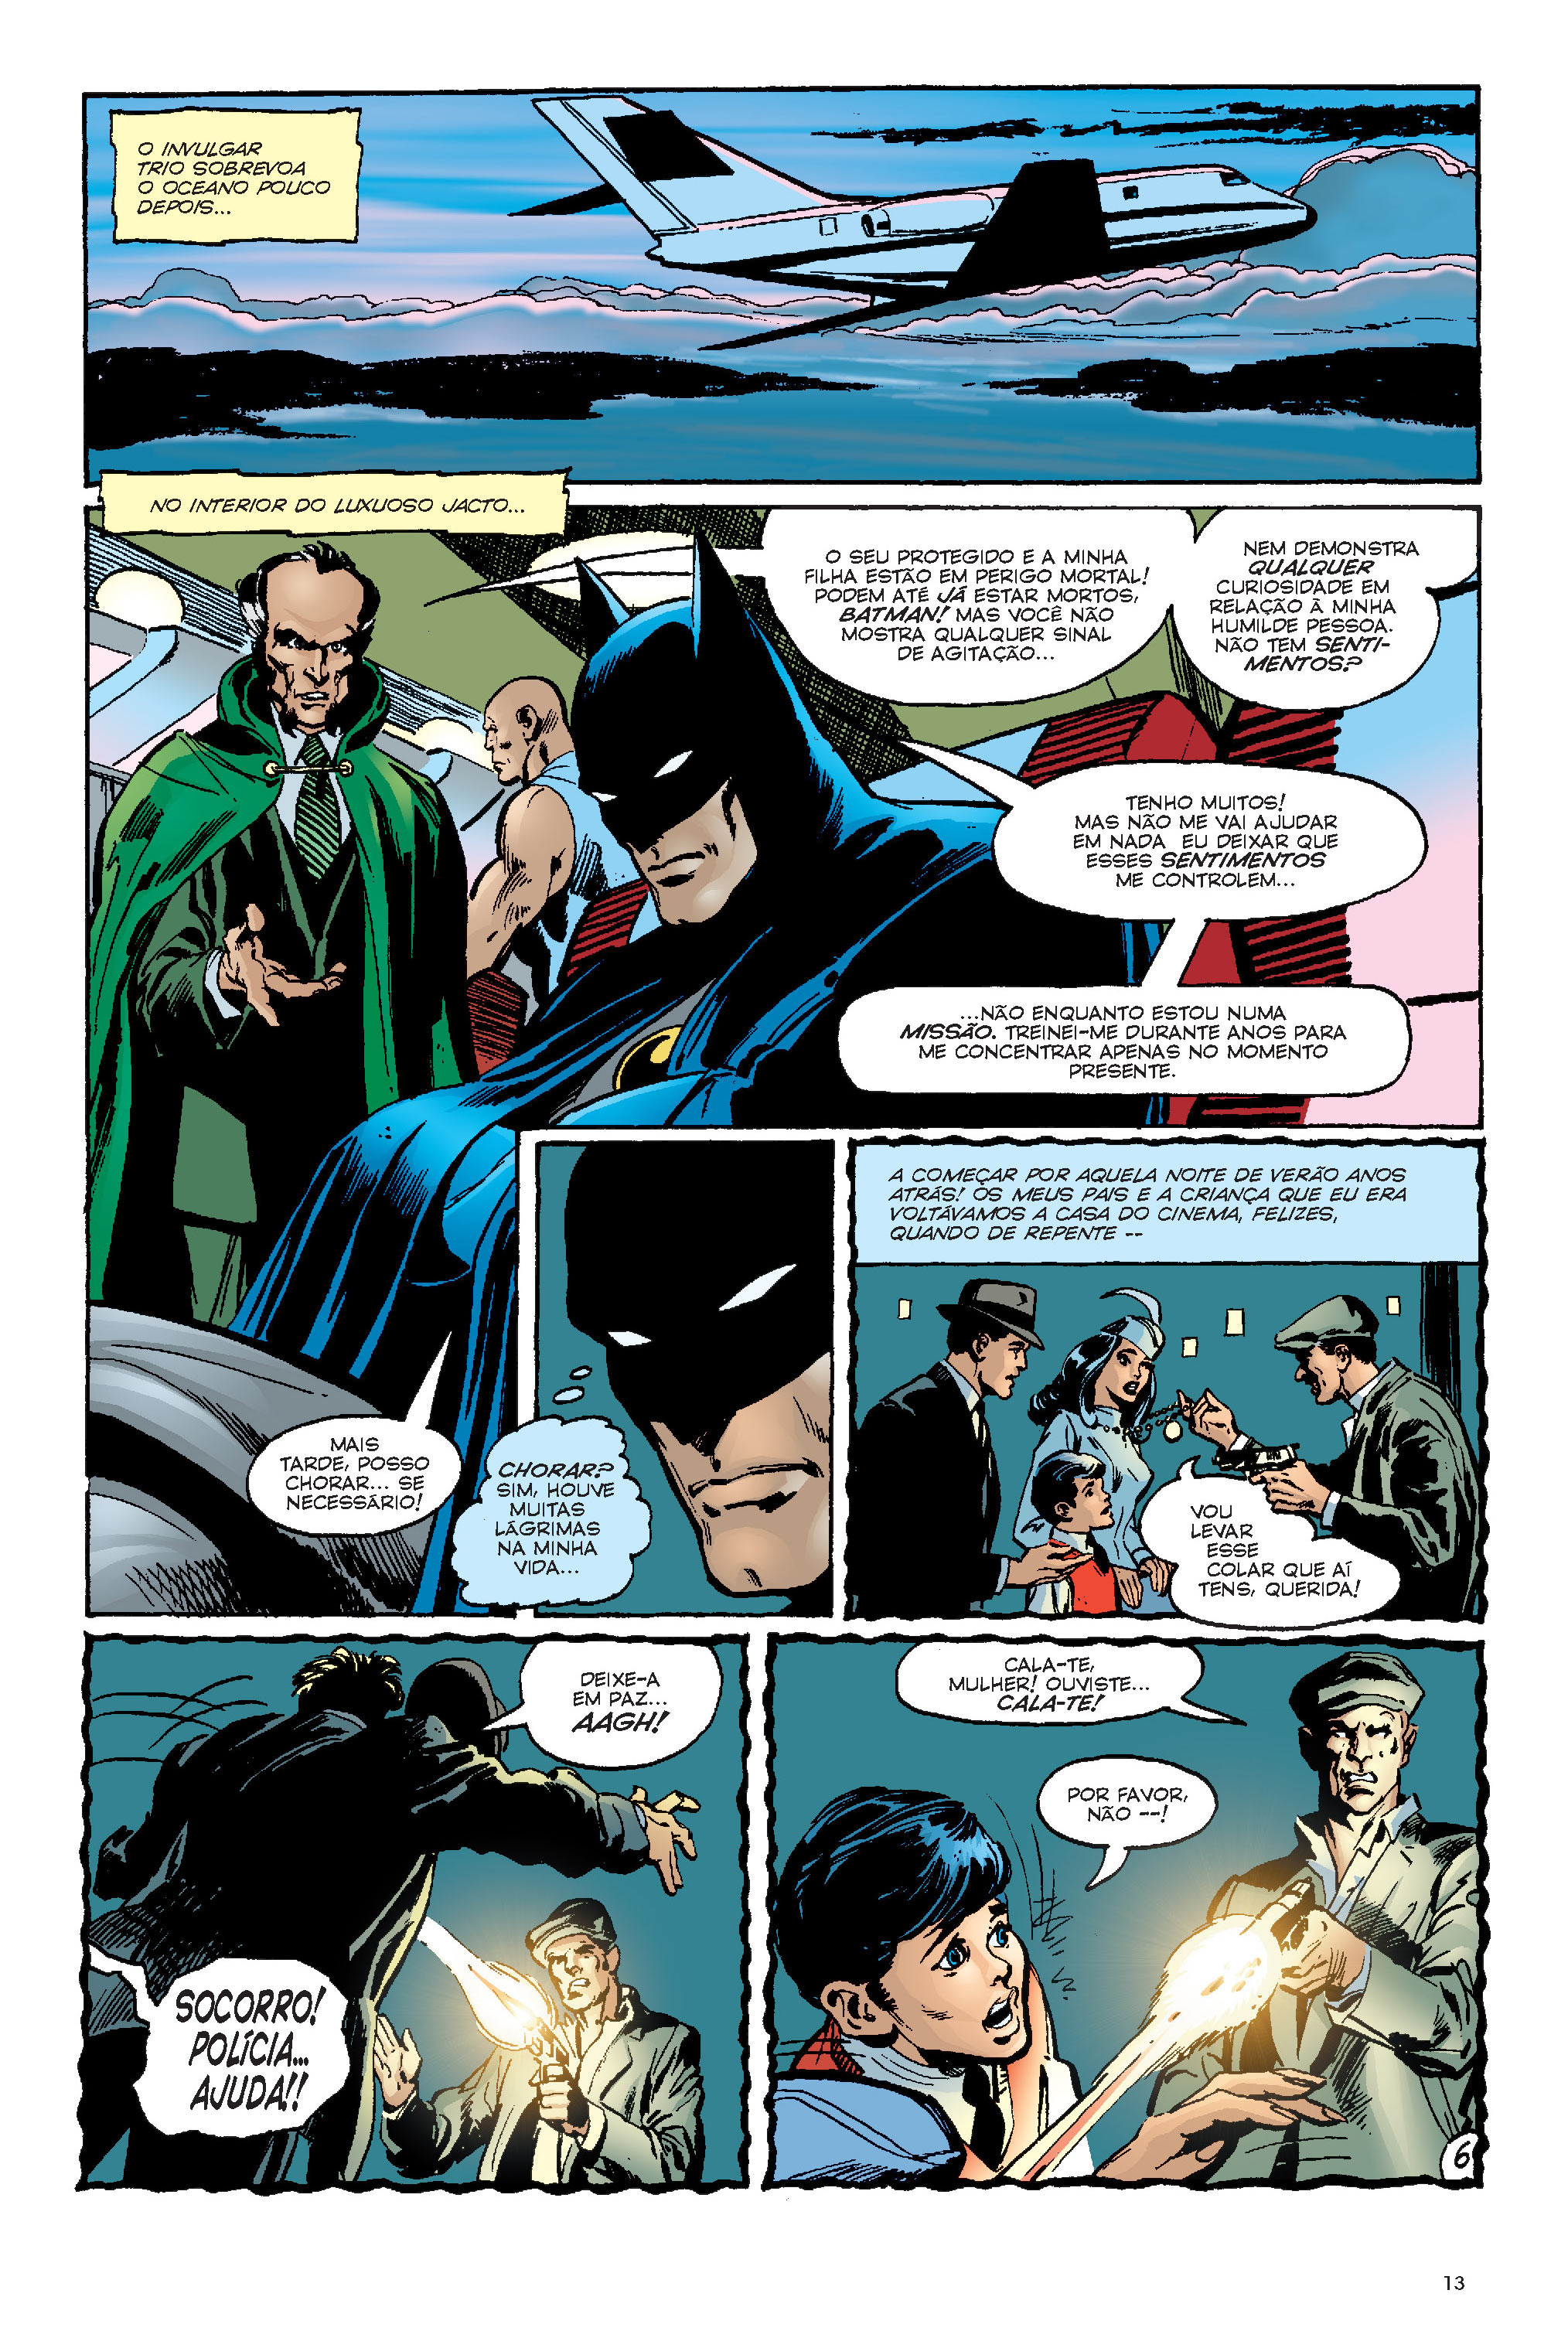 Batman Saga de Ras Al Ghul - página 6